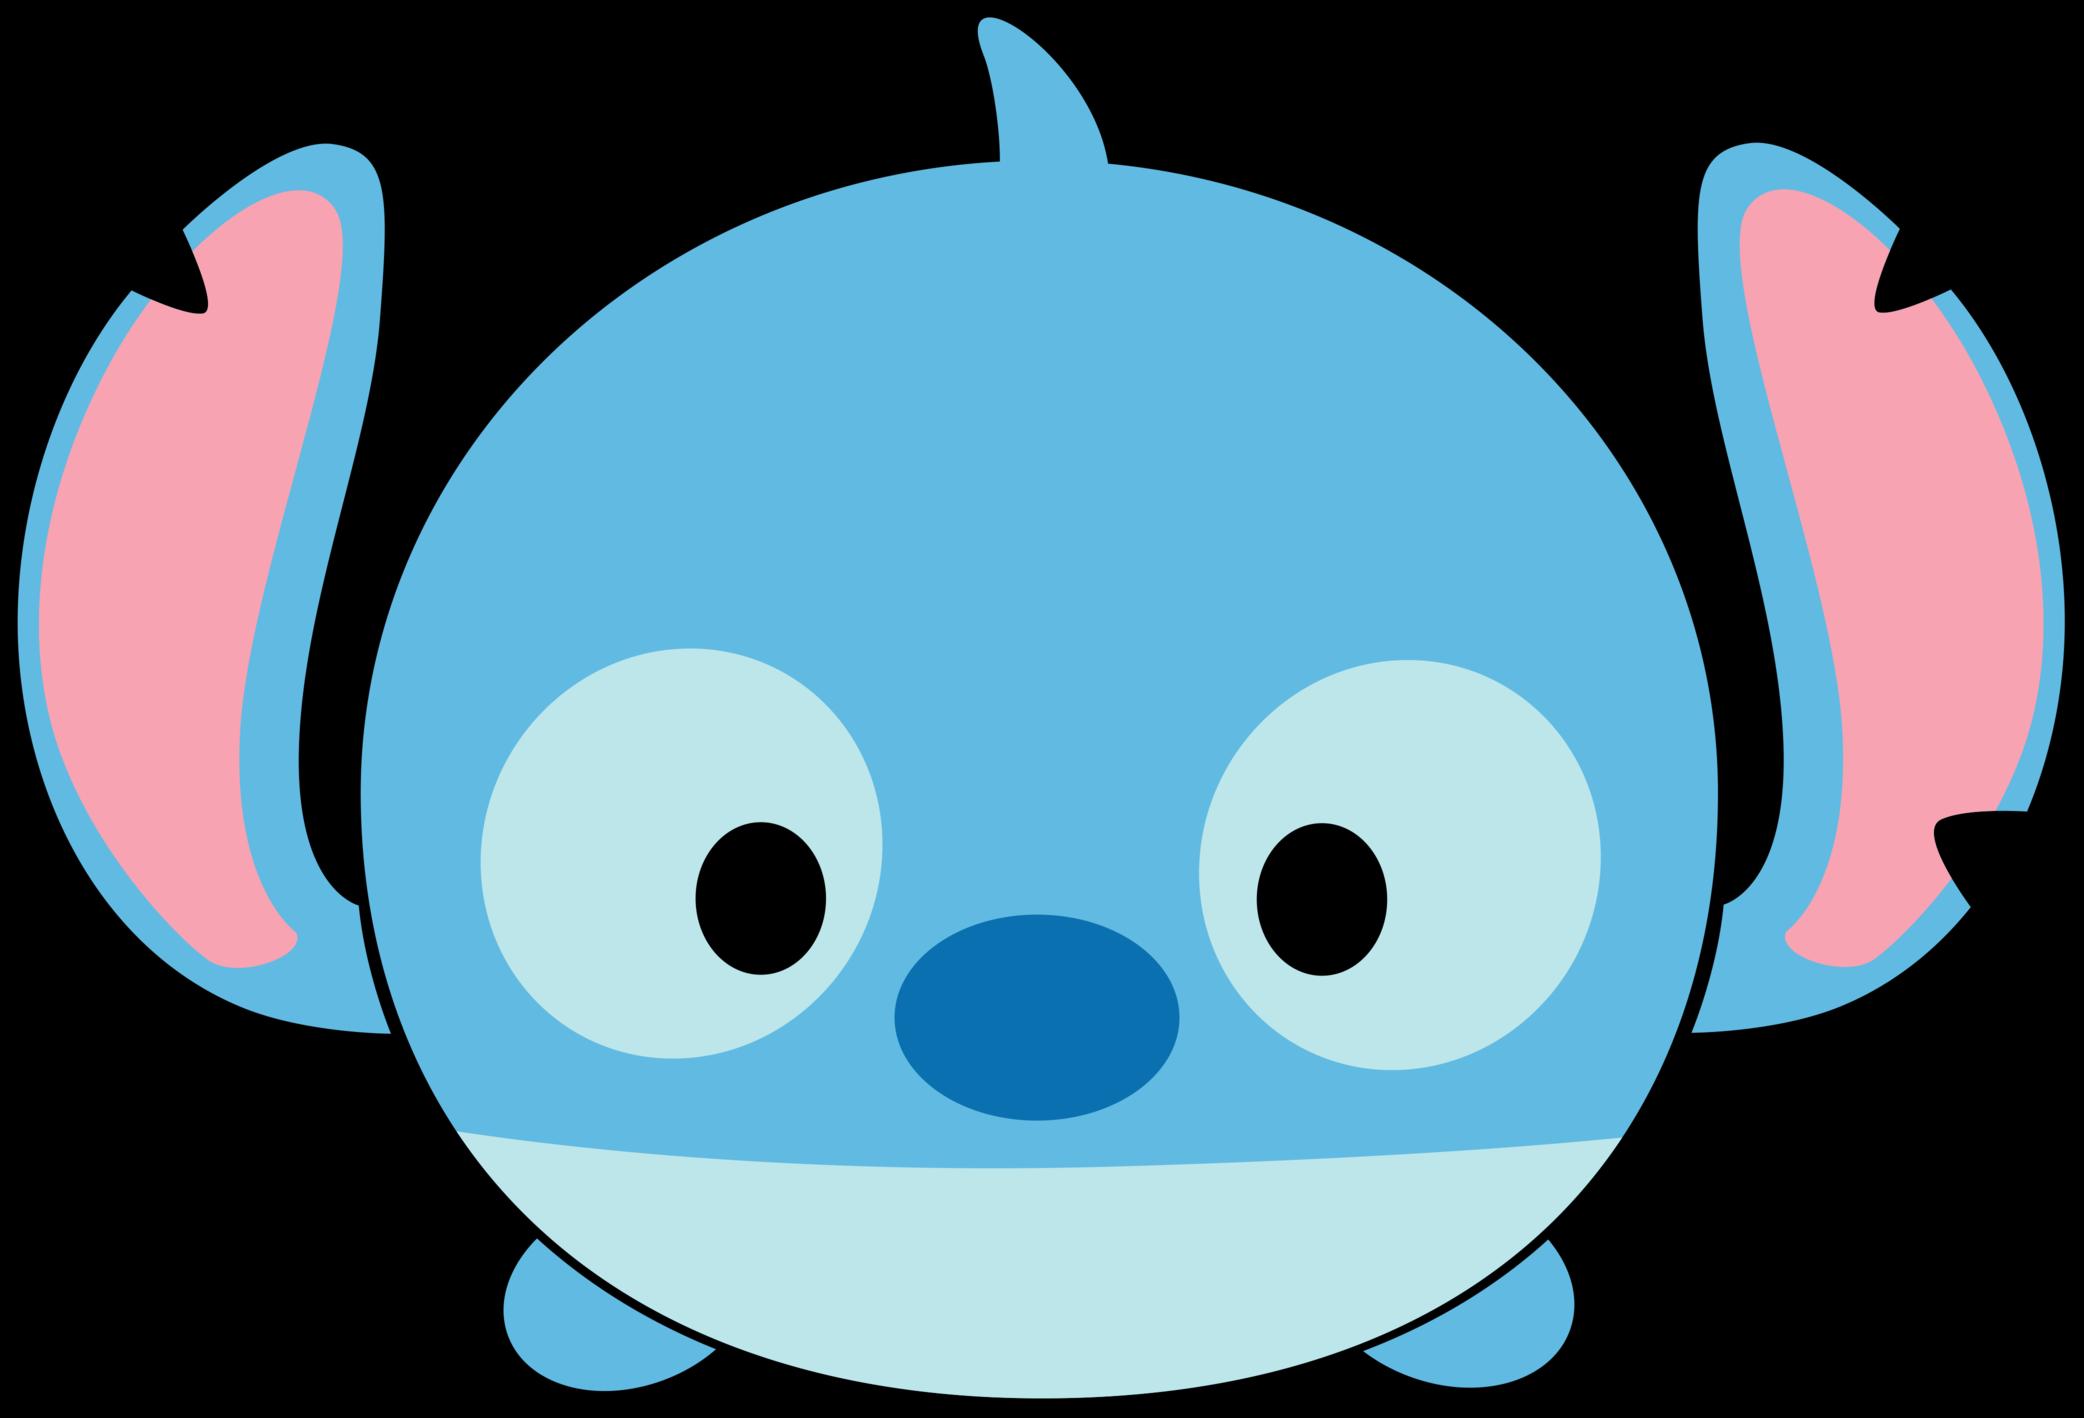 Disney Tsum Tsum Para Colorear Piglet Tusm Tusm: DISNEY TSUM TSUM Stitch